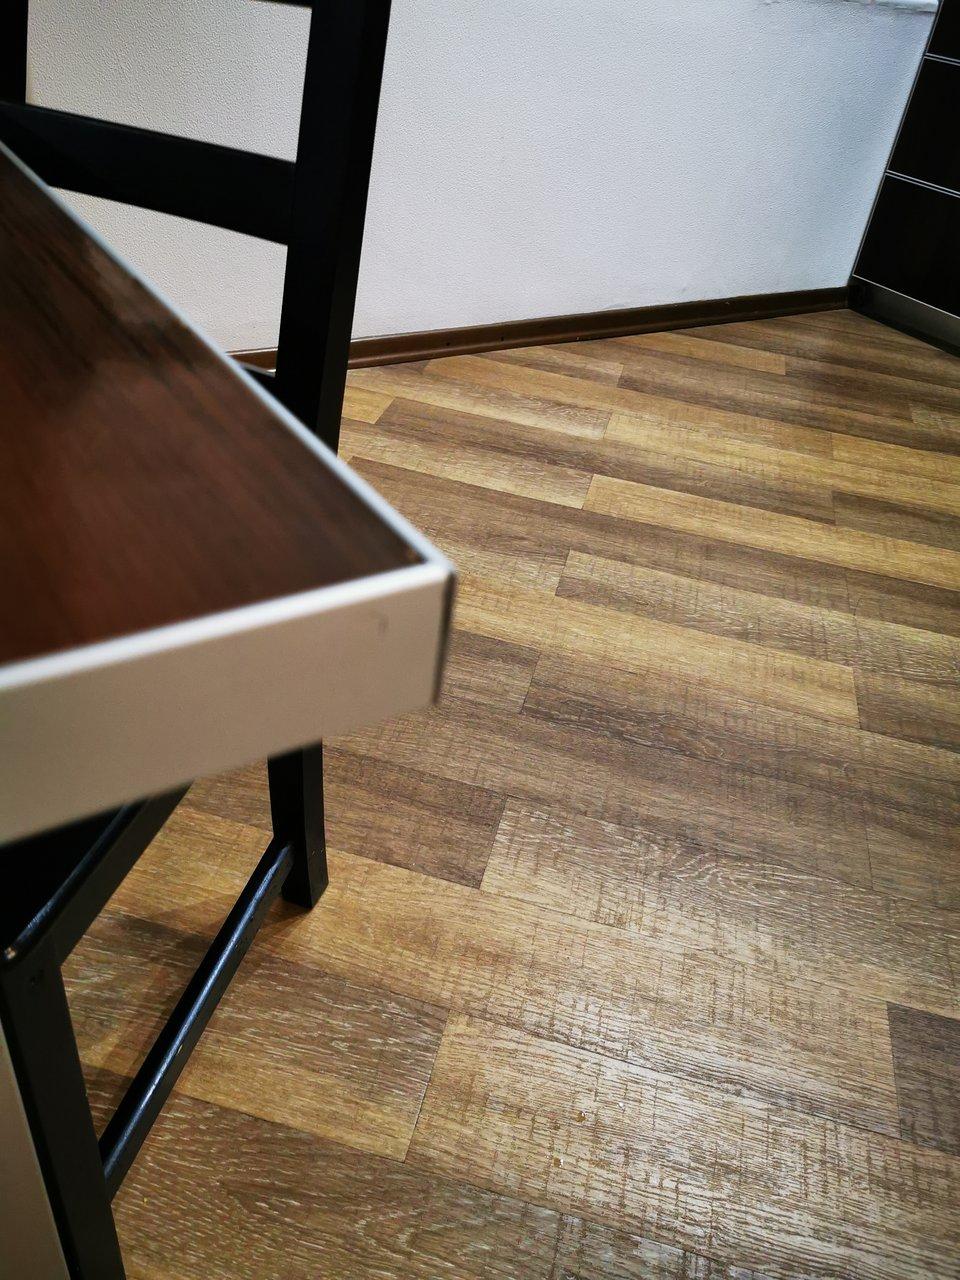 Apartments Nevsky 150 Prices Condominium Reviews St